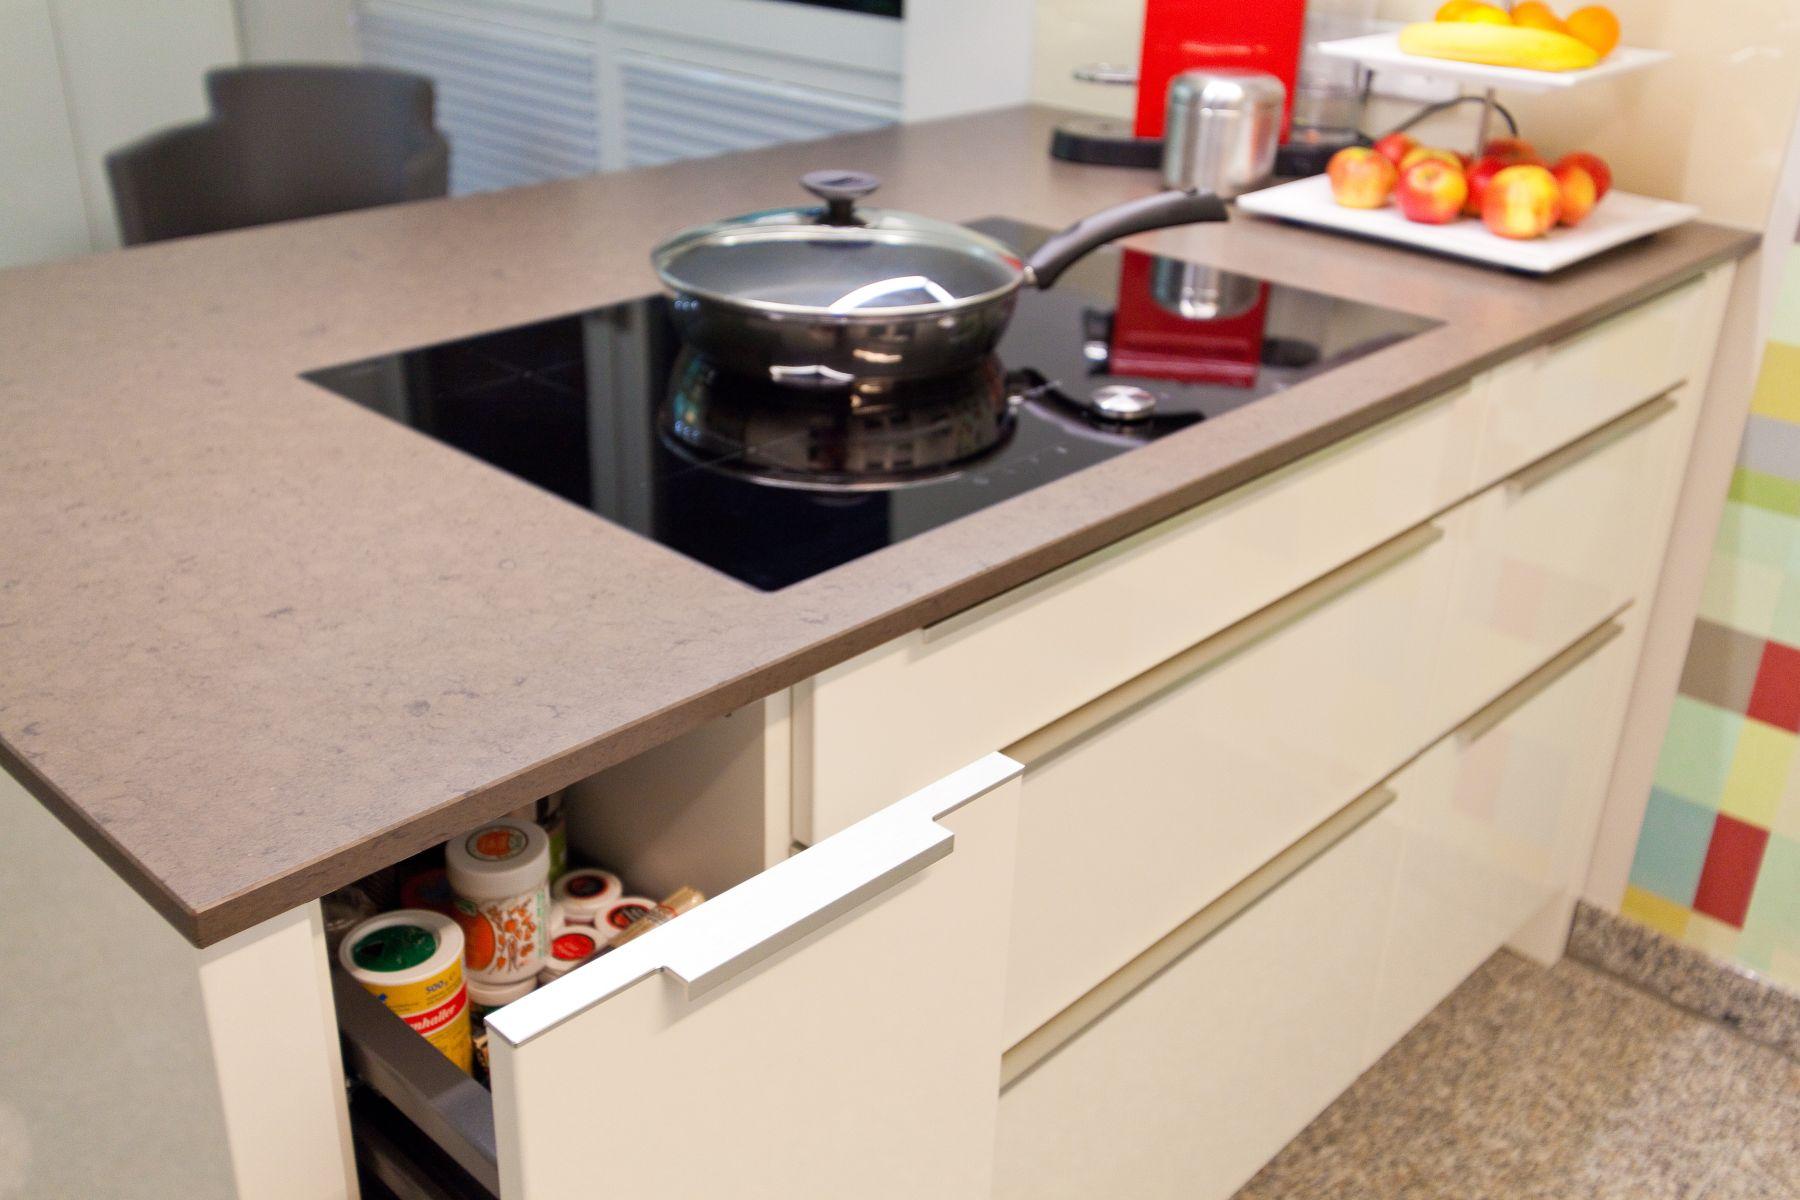 Waschbecken küche granit  Waschbecken Küche Granit | gispatcher.com